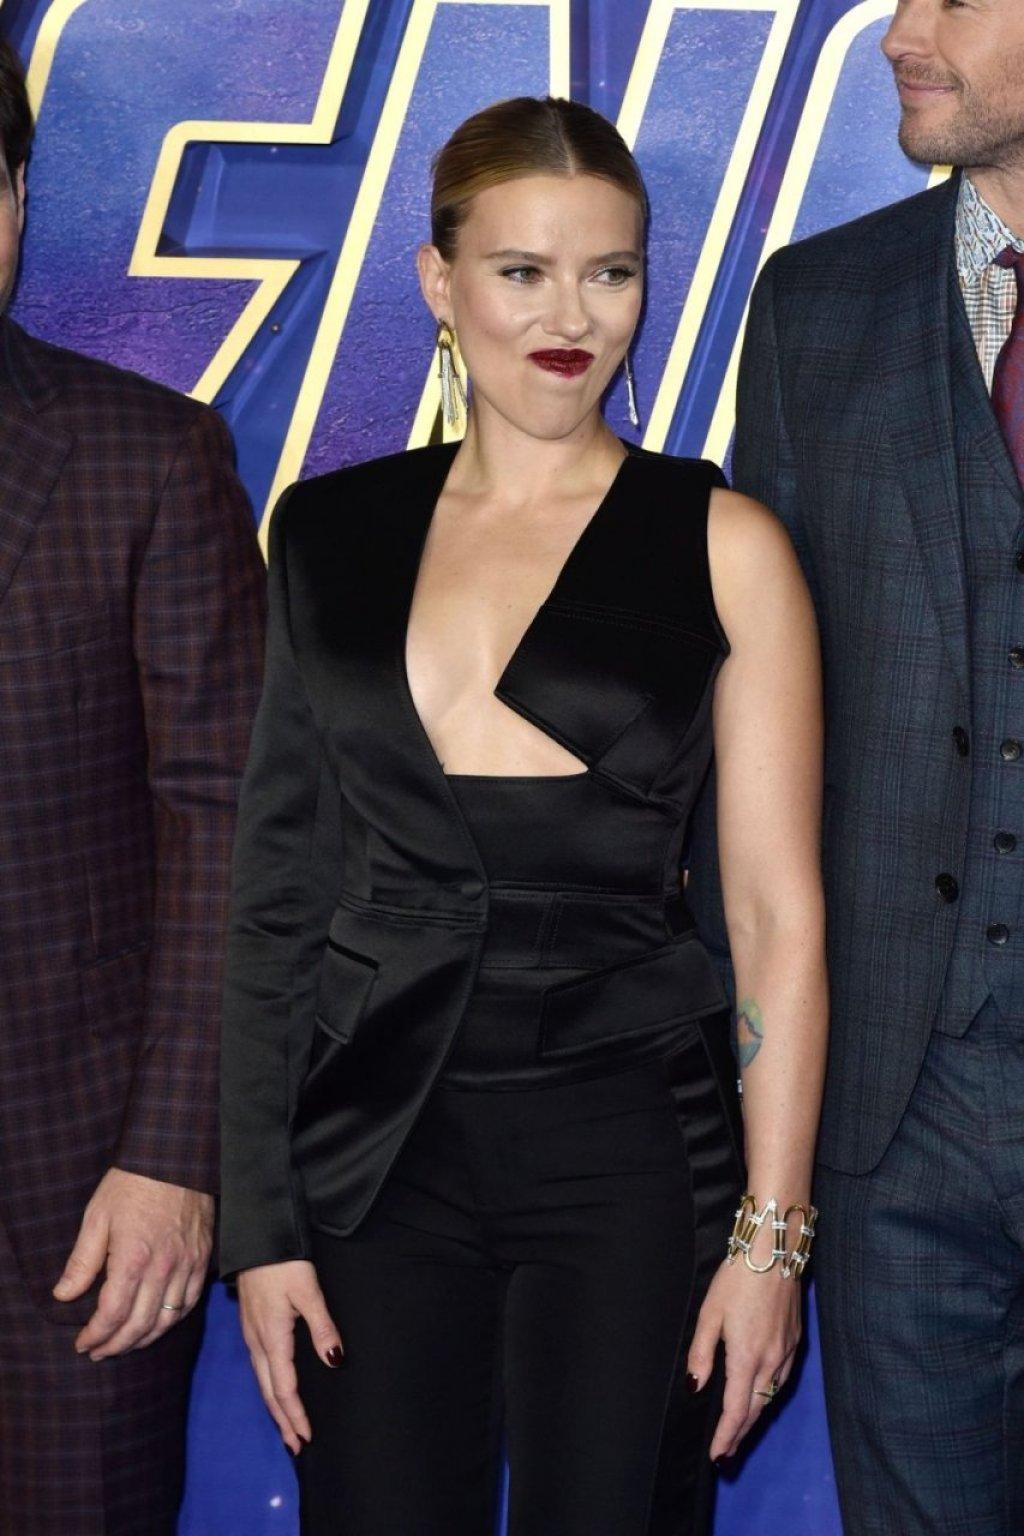 Scarlett Johansson Sexy (39 Photos)